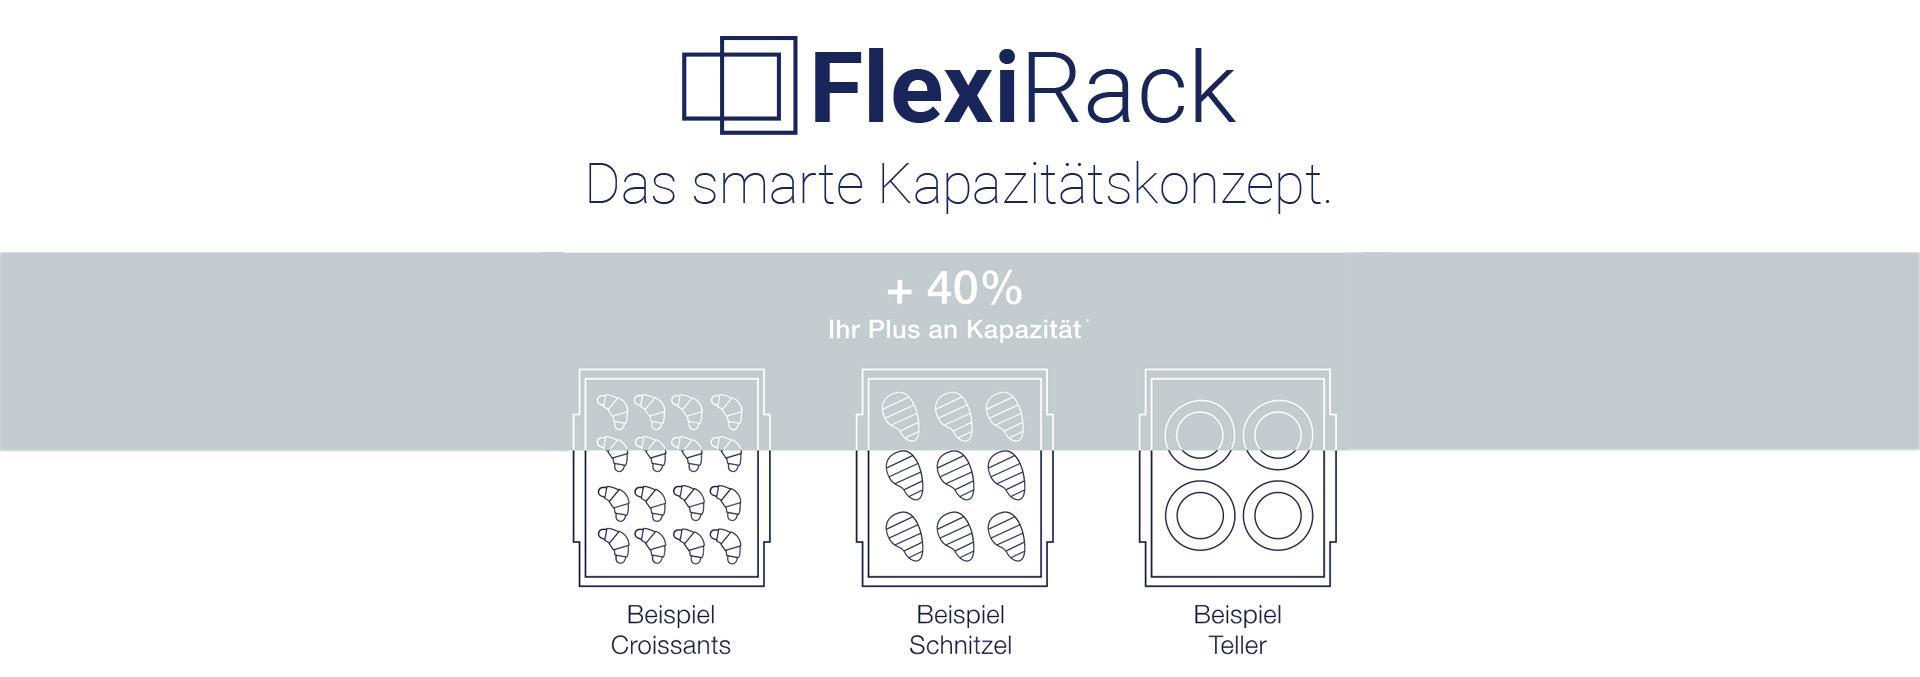 FlexiRack MKN